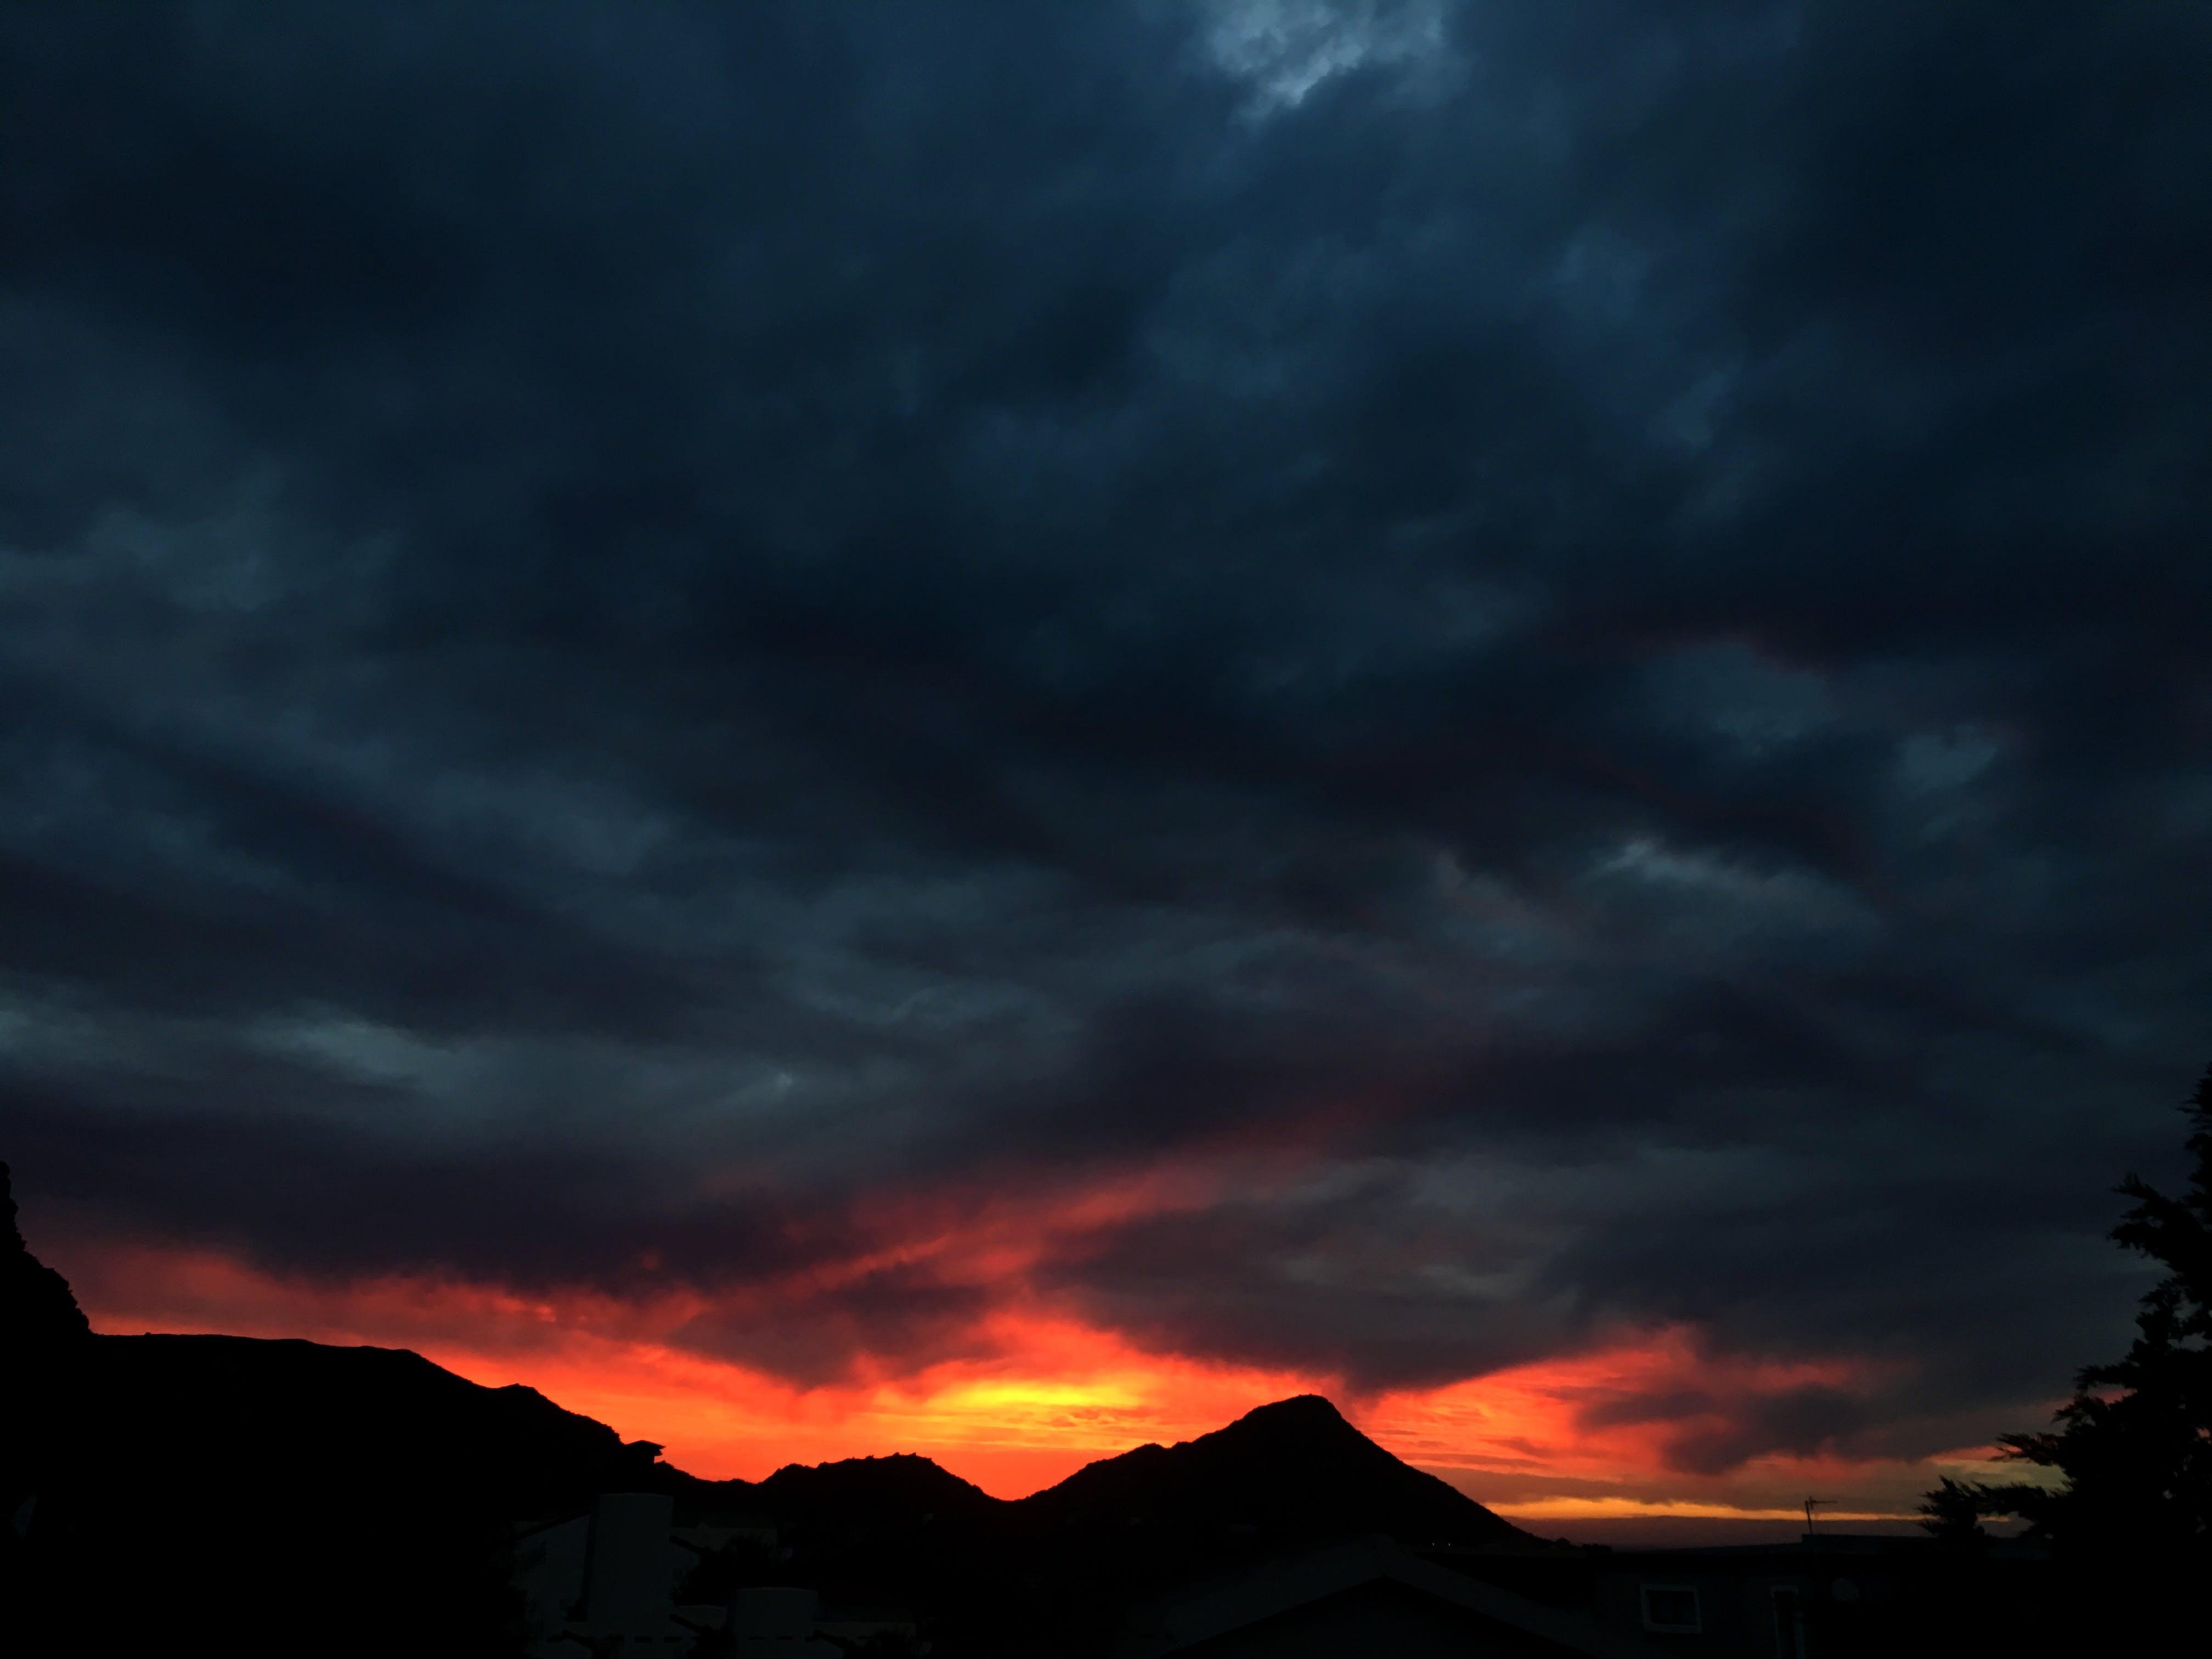 Free stock photo of cauldron, cloud, dark clouds, Dark Sky